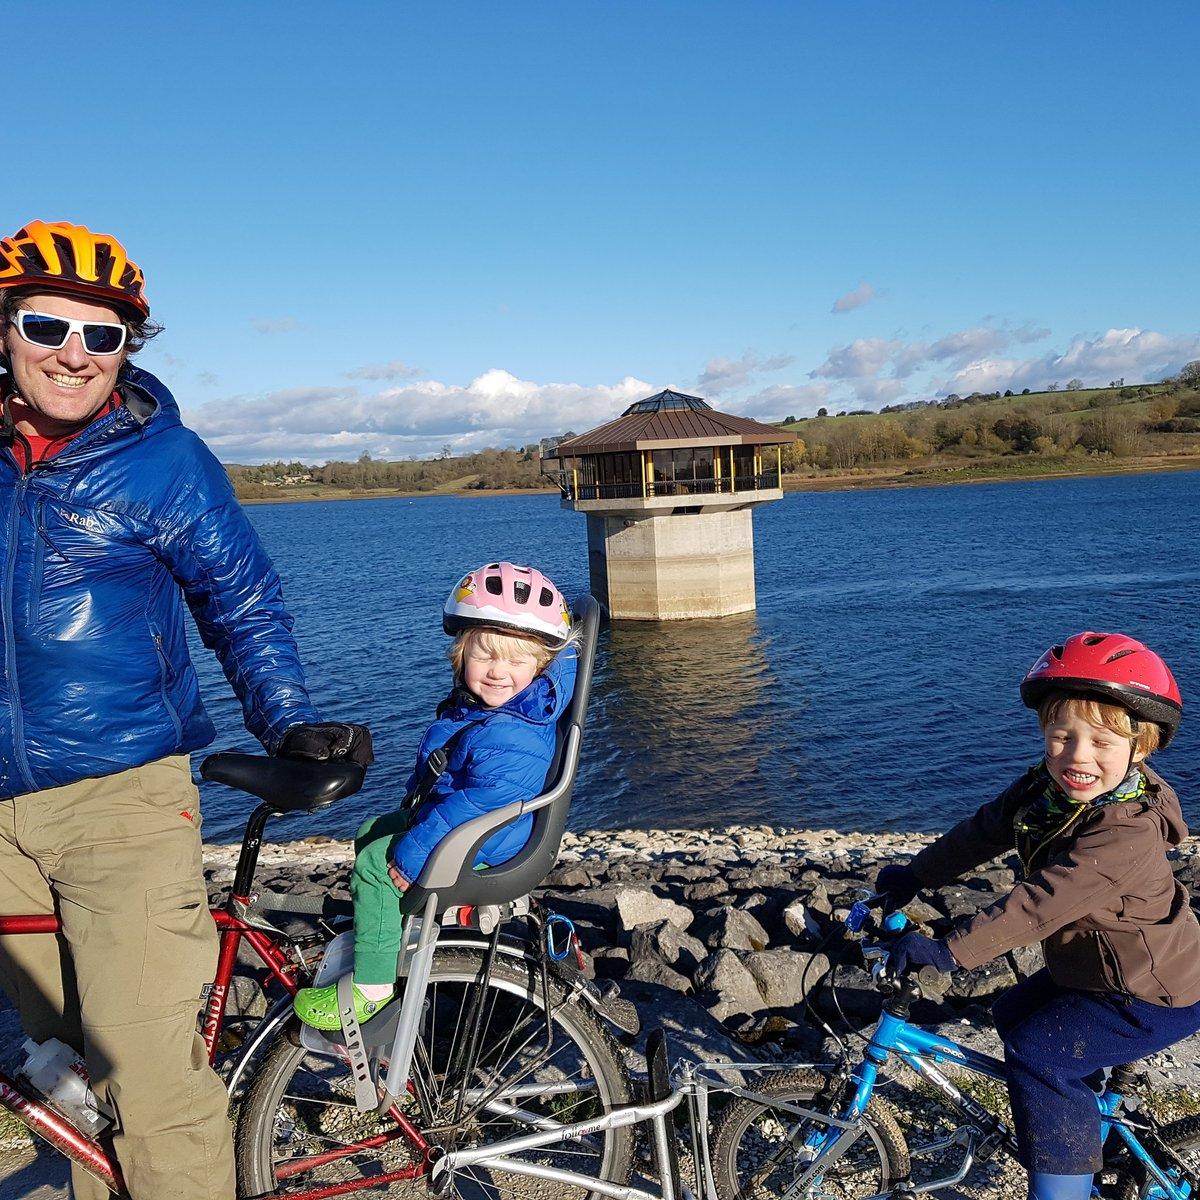 Bambino Biking On Twitter The First Bambino Biking Longford Park